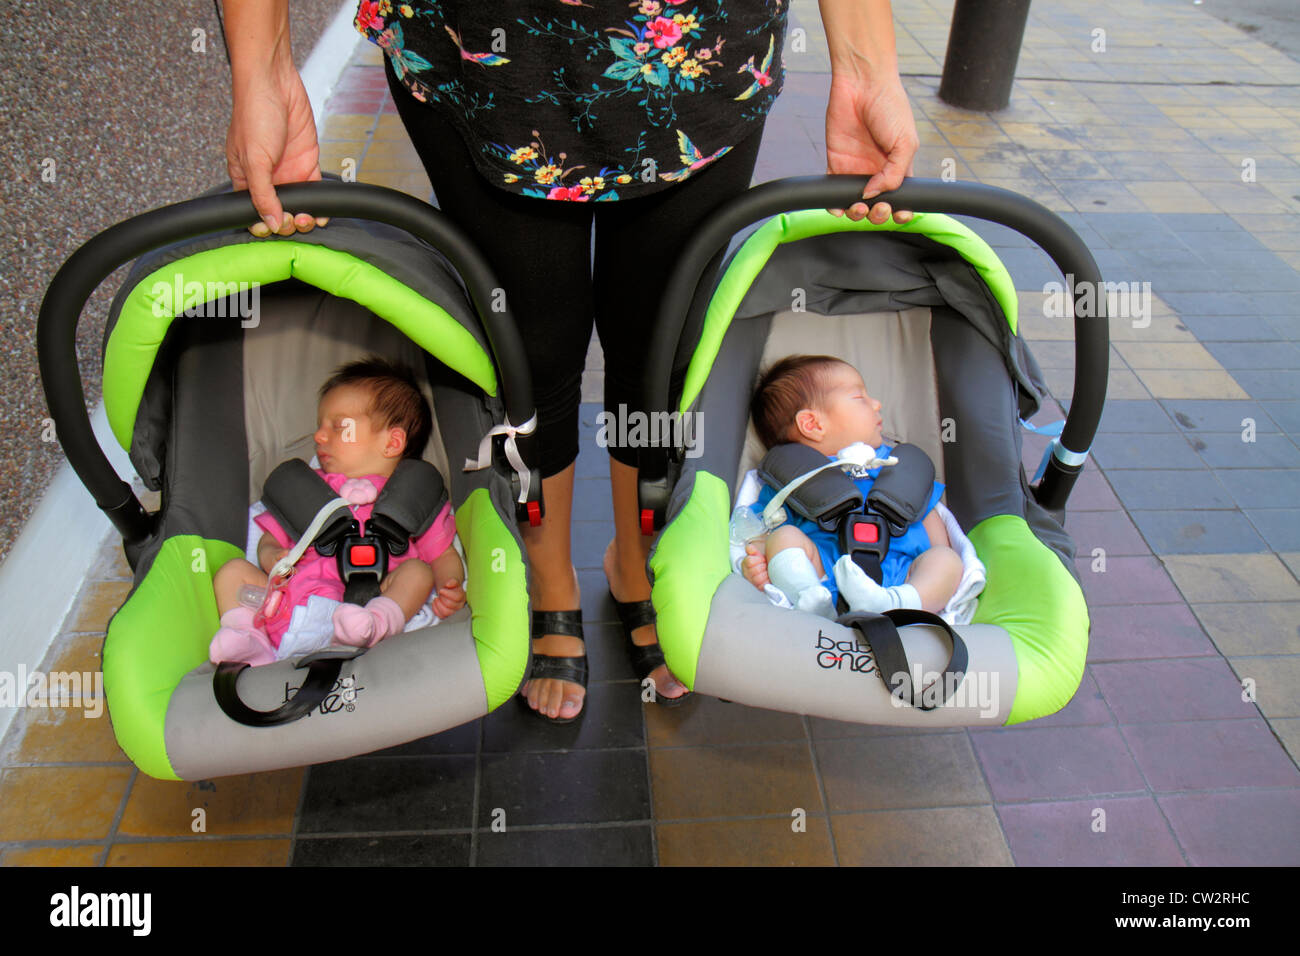 mendoza argentina avenida san martin hispanic baby infant boy girl stock photo royalty free. Black Bedroom Furniture Sets. Home Design Ideas